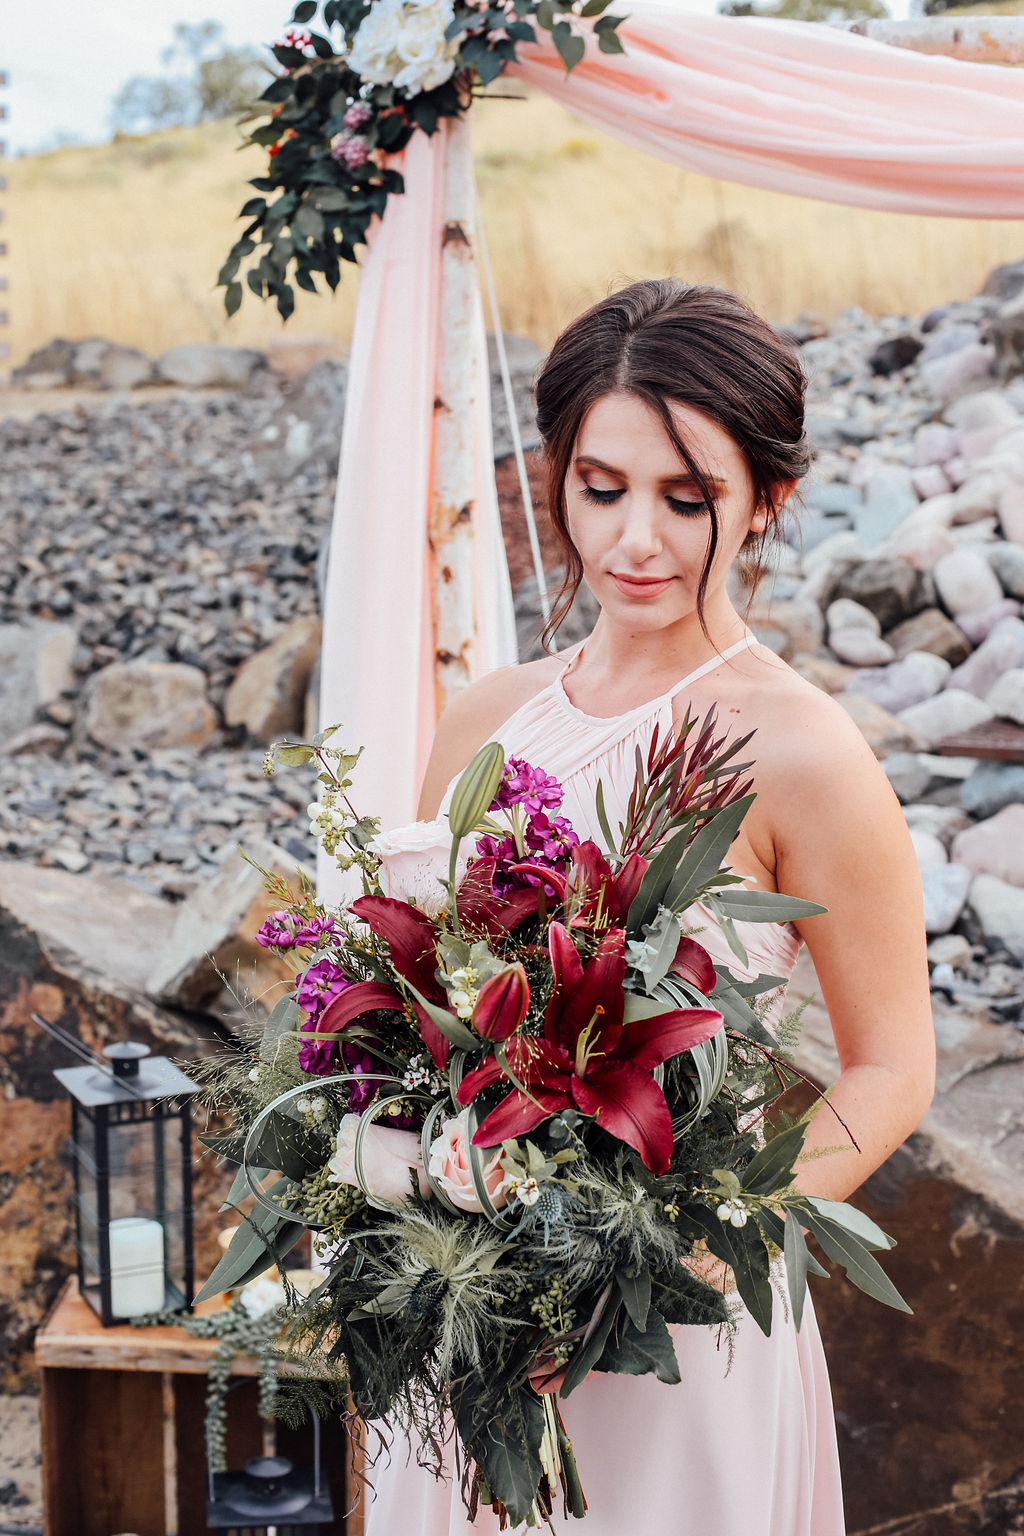 509 Bride_the 509 bride_purple pineapple photography_16